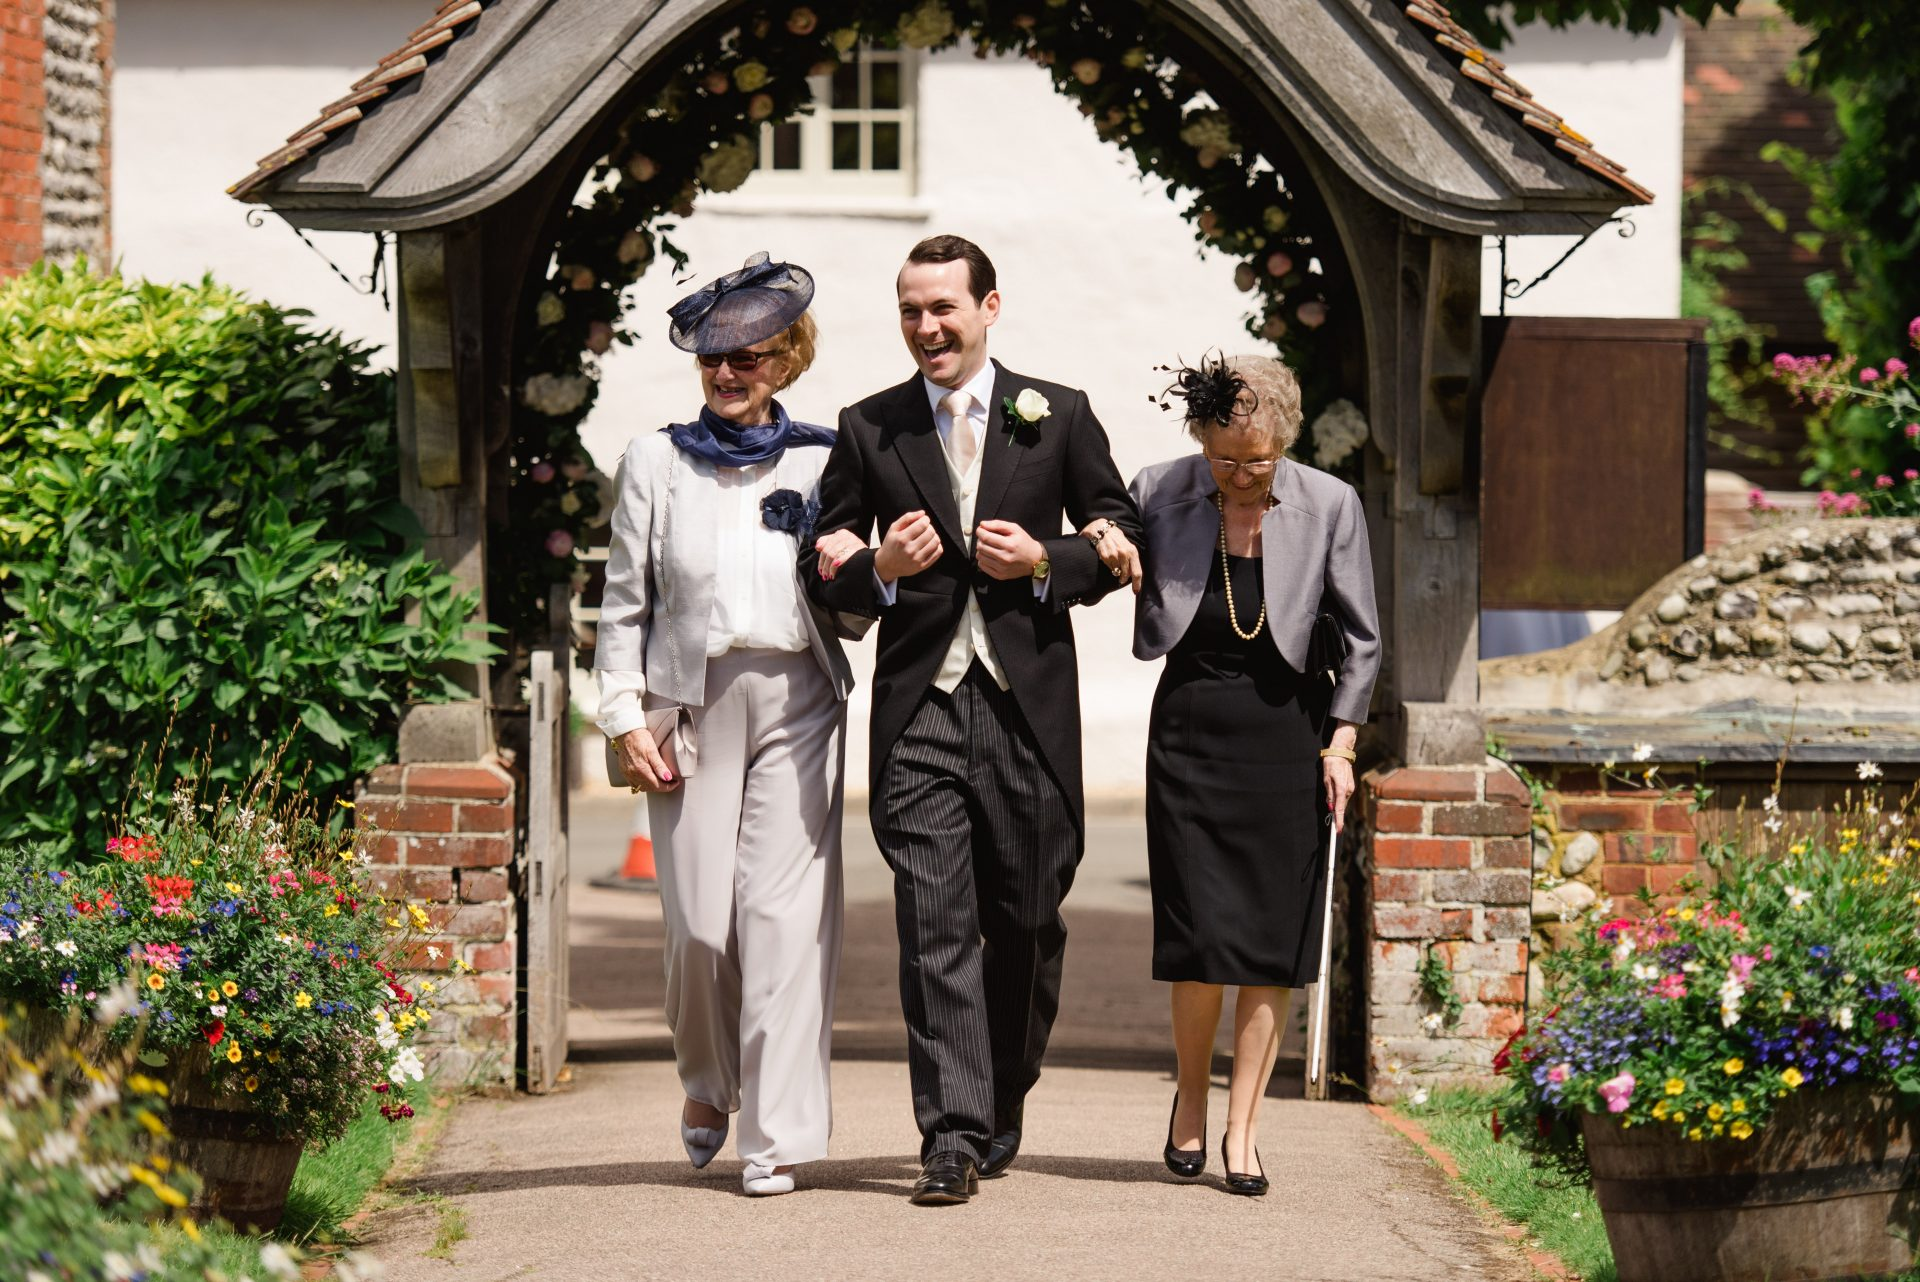 Wiston House Wedding - Stewart Girvan Photography